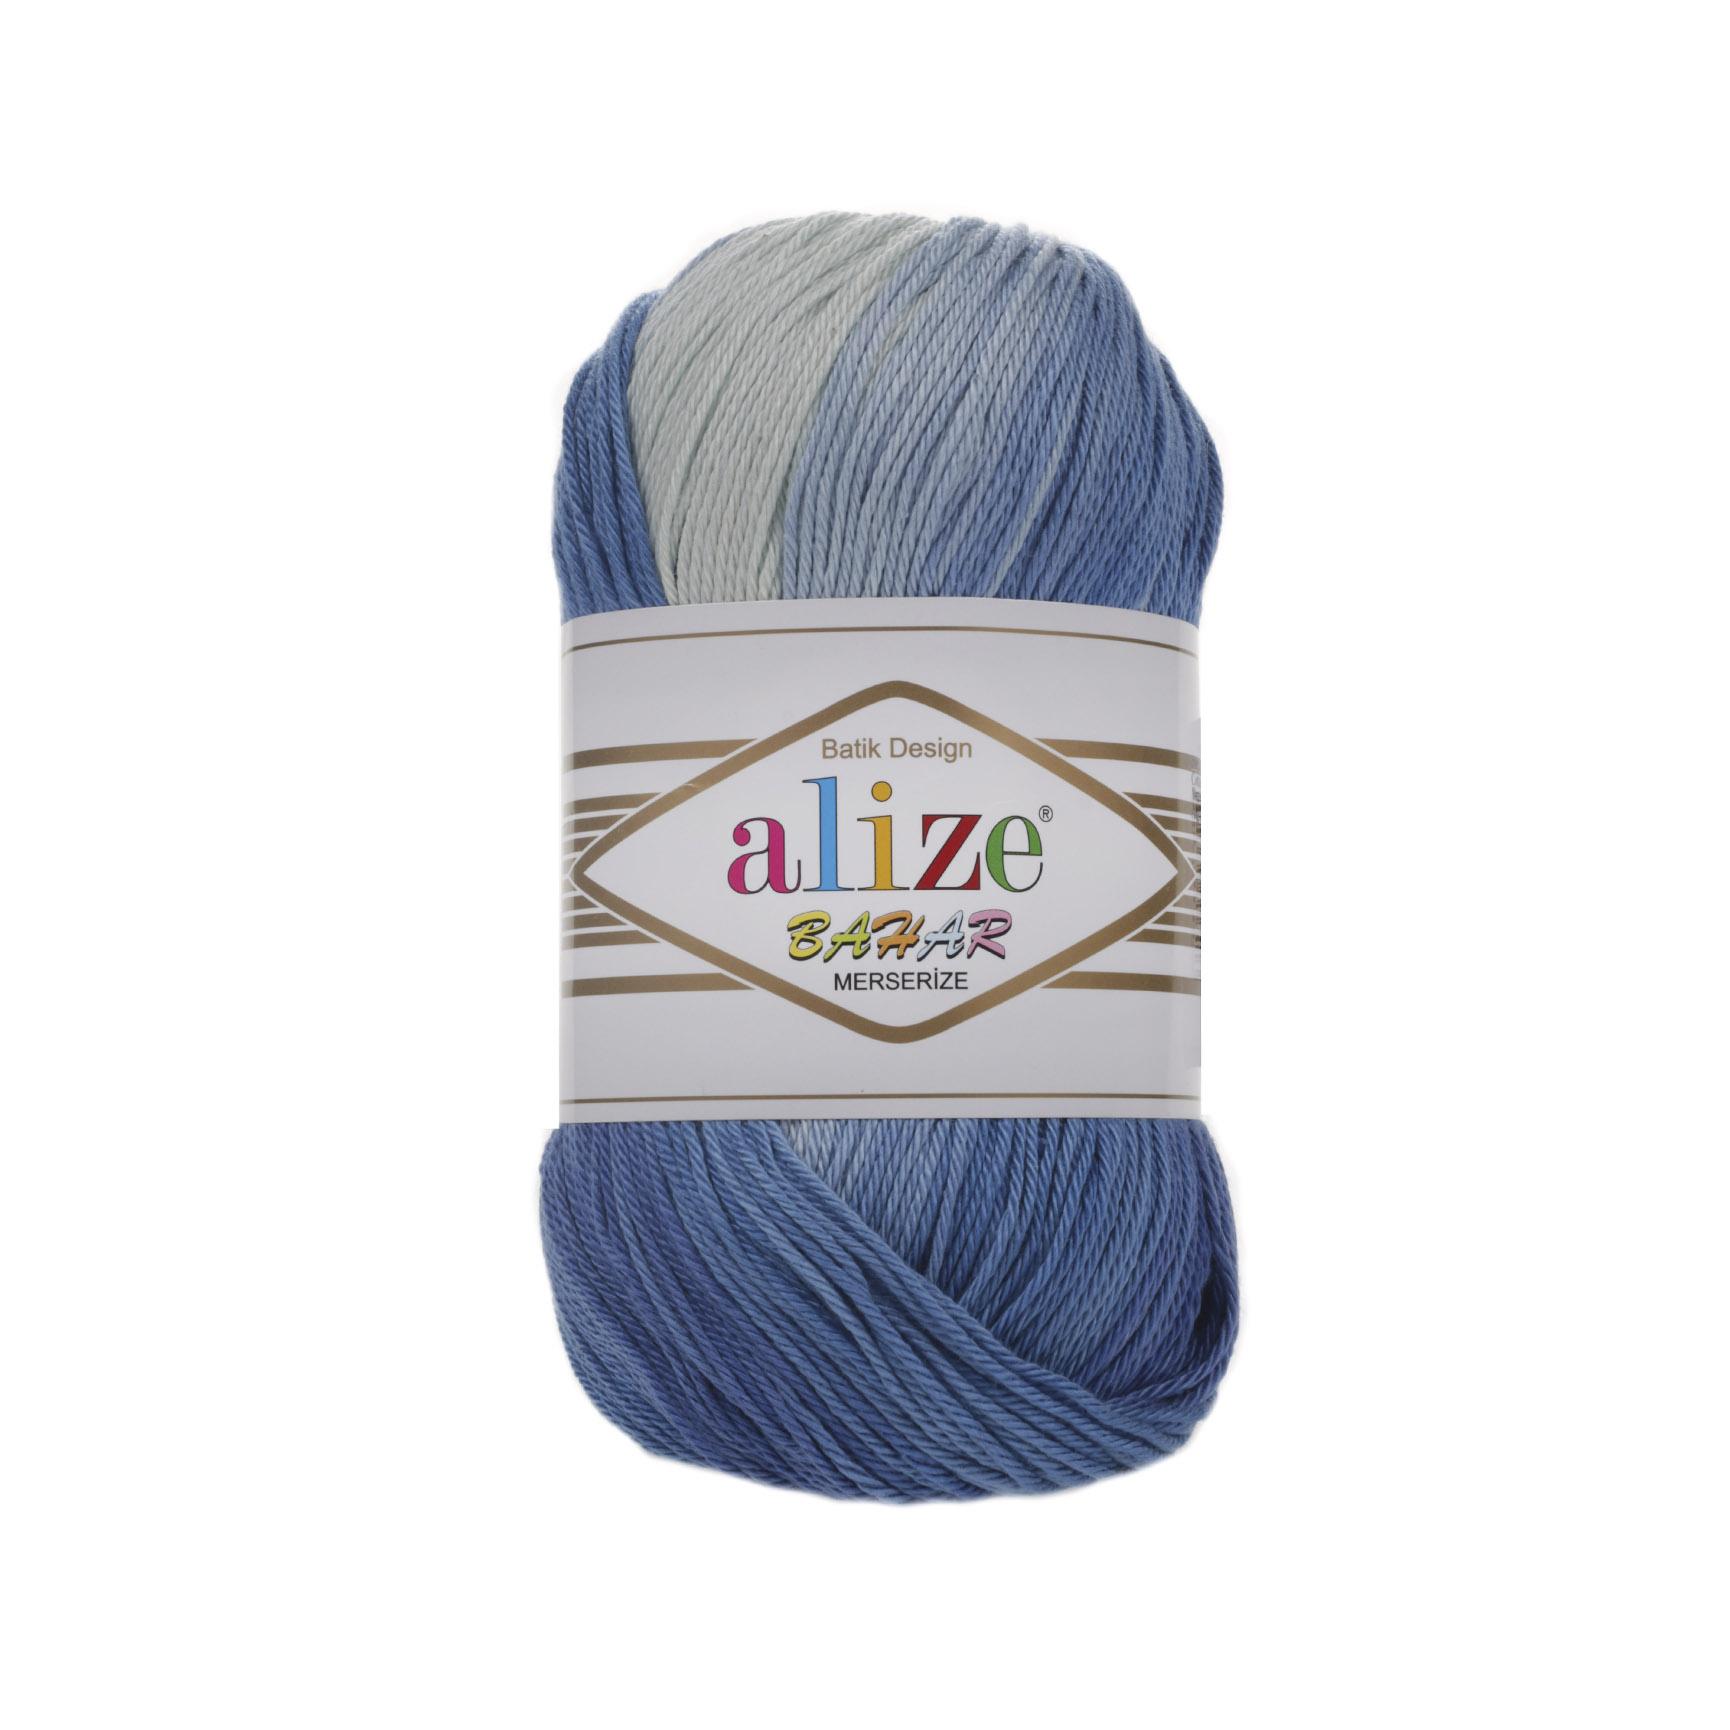 Alize Bahar Batik Design Cod 1833-0